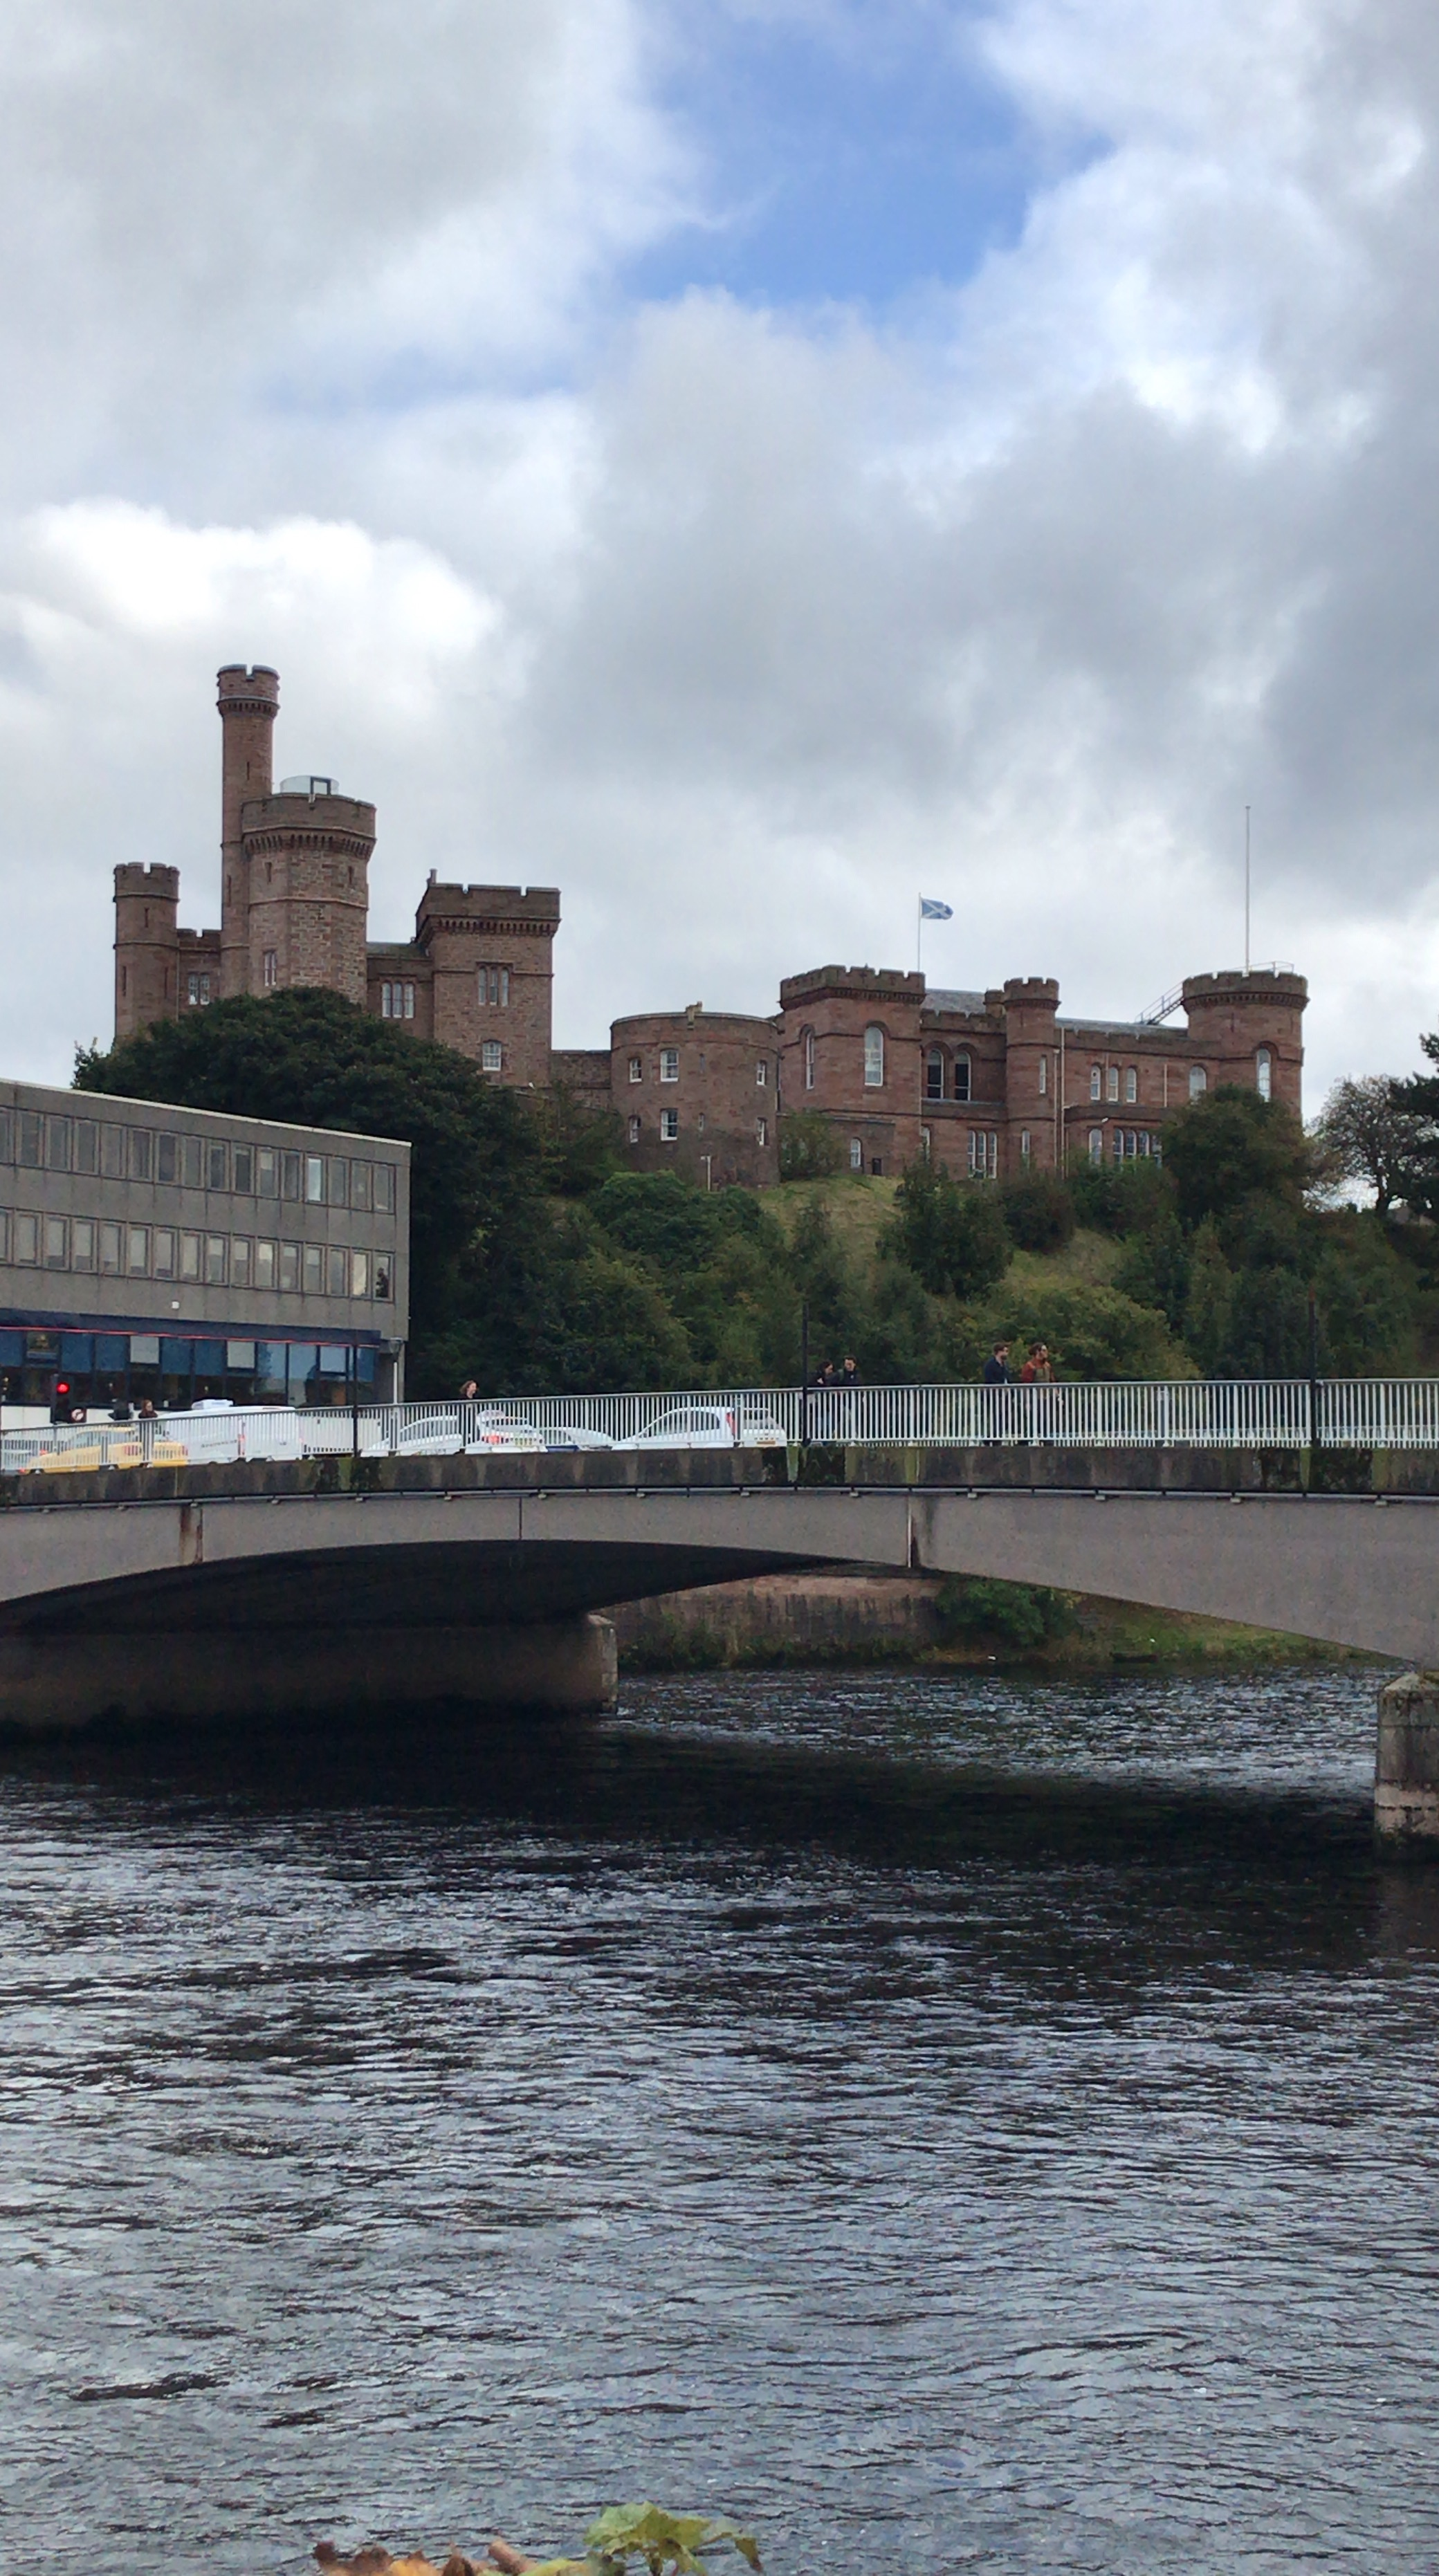 red brick castle above a bridge and river